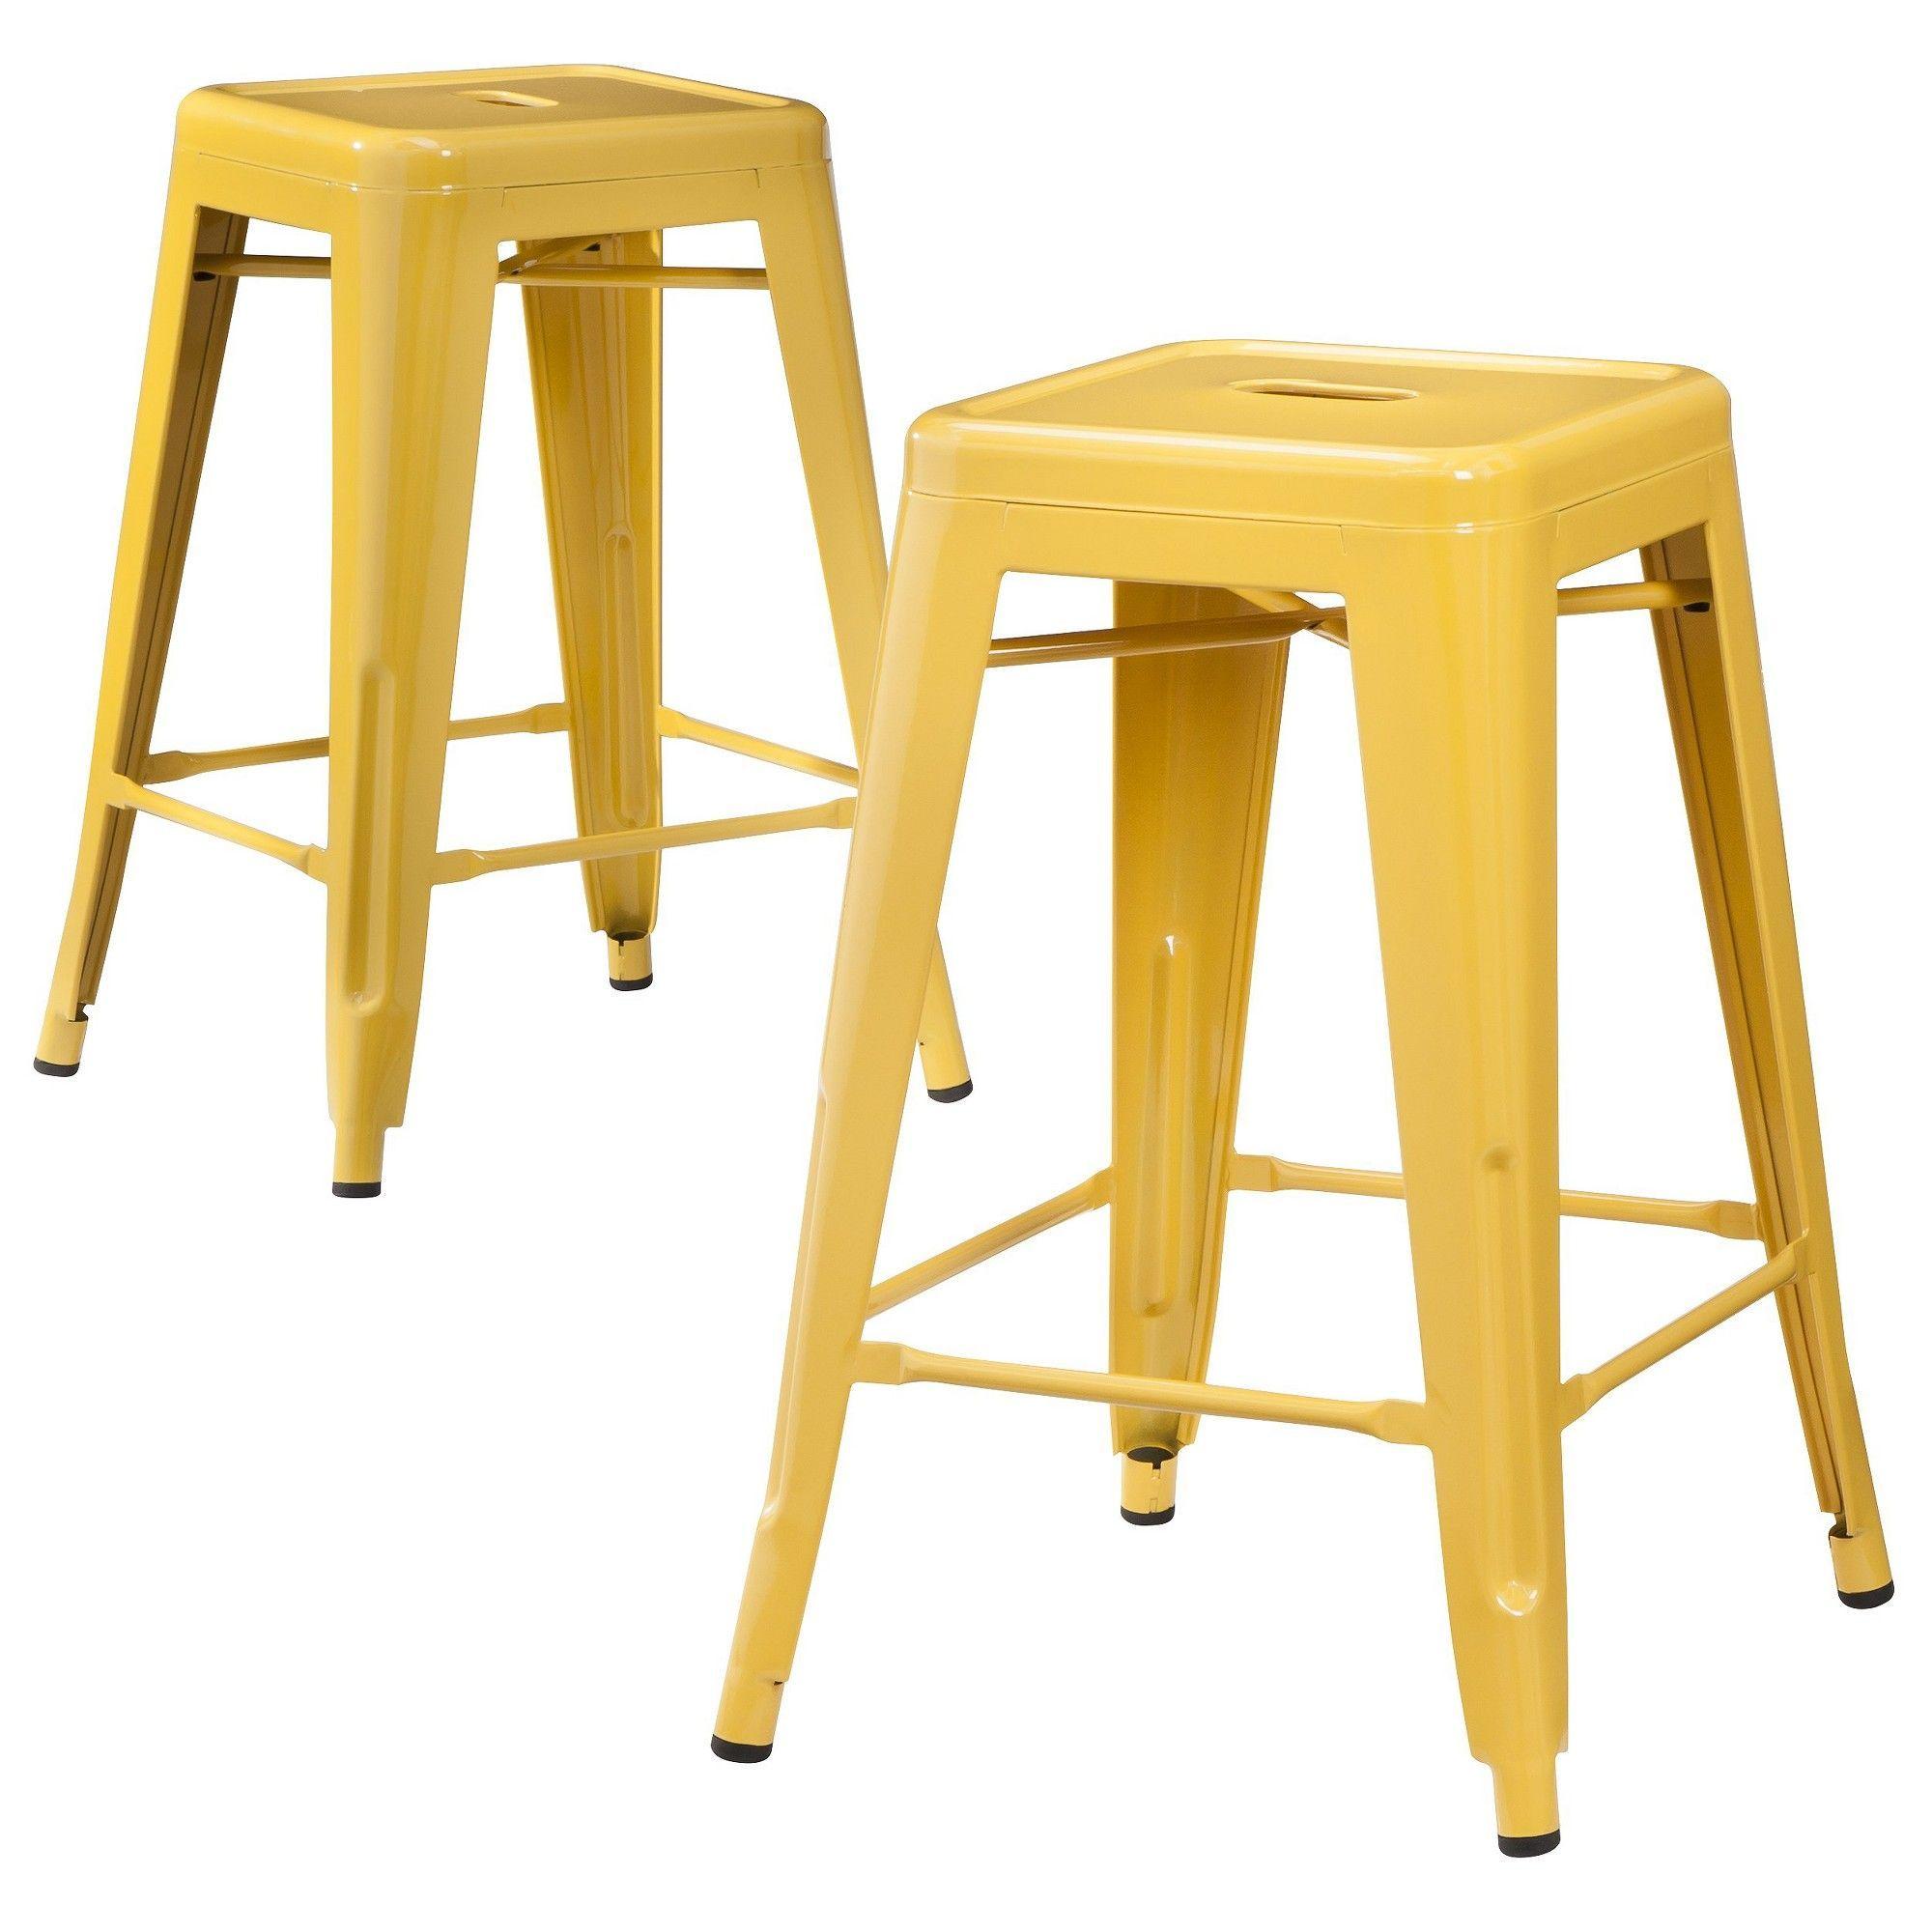 Superb Carlisle Metal 24 Counter Stool Yellow Set Of 2 Creativecarmelina Interior Chair Design Creativecarmelinacom